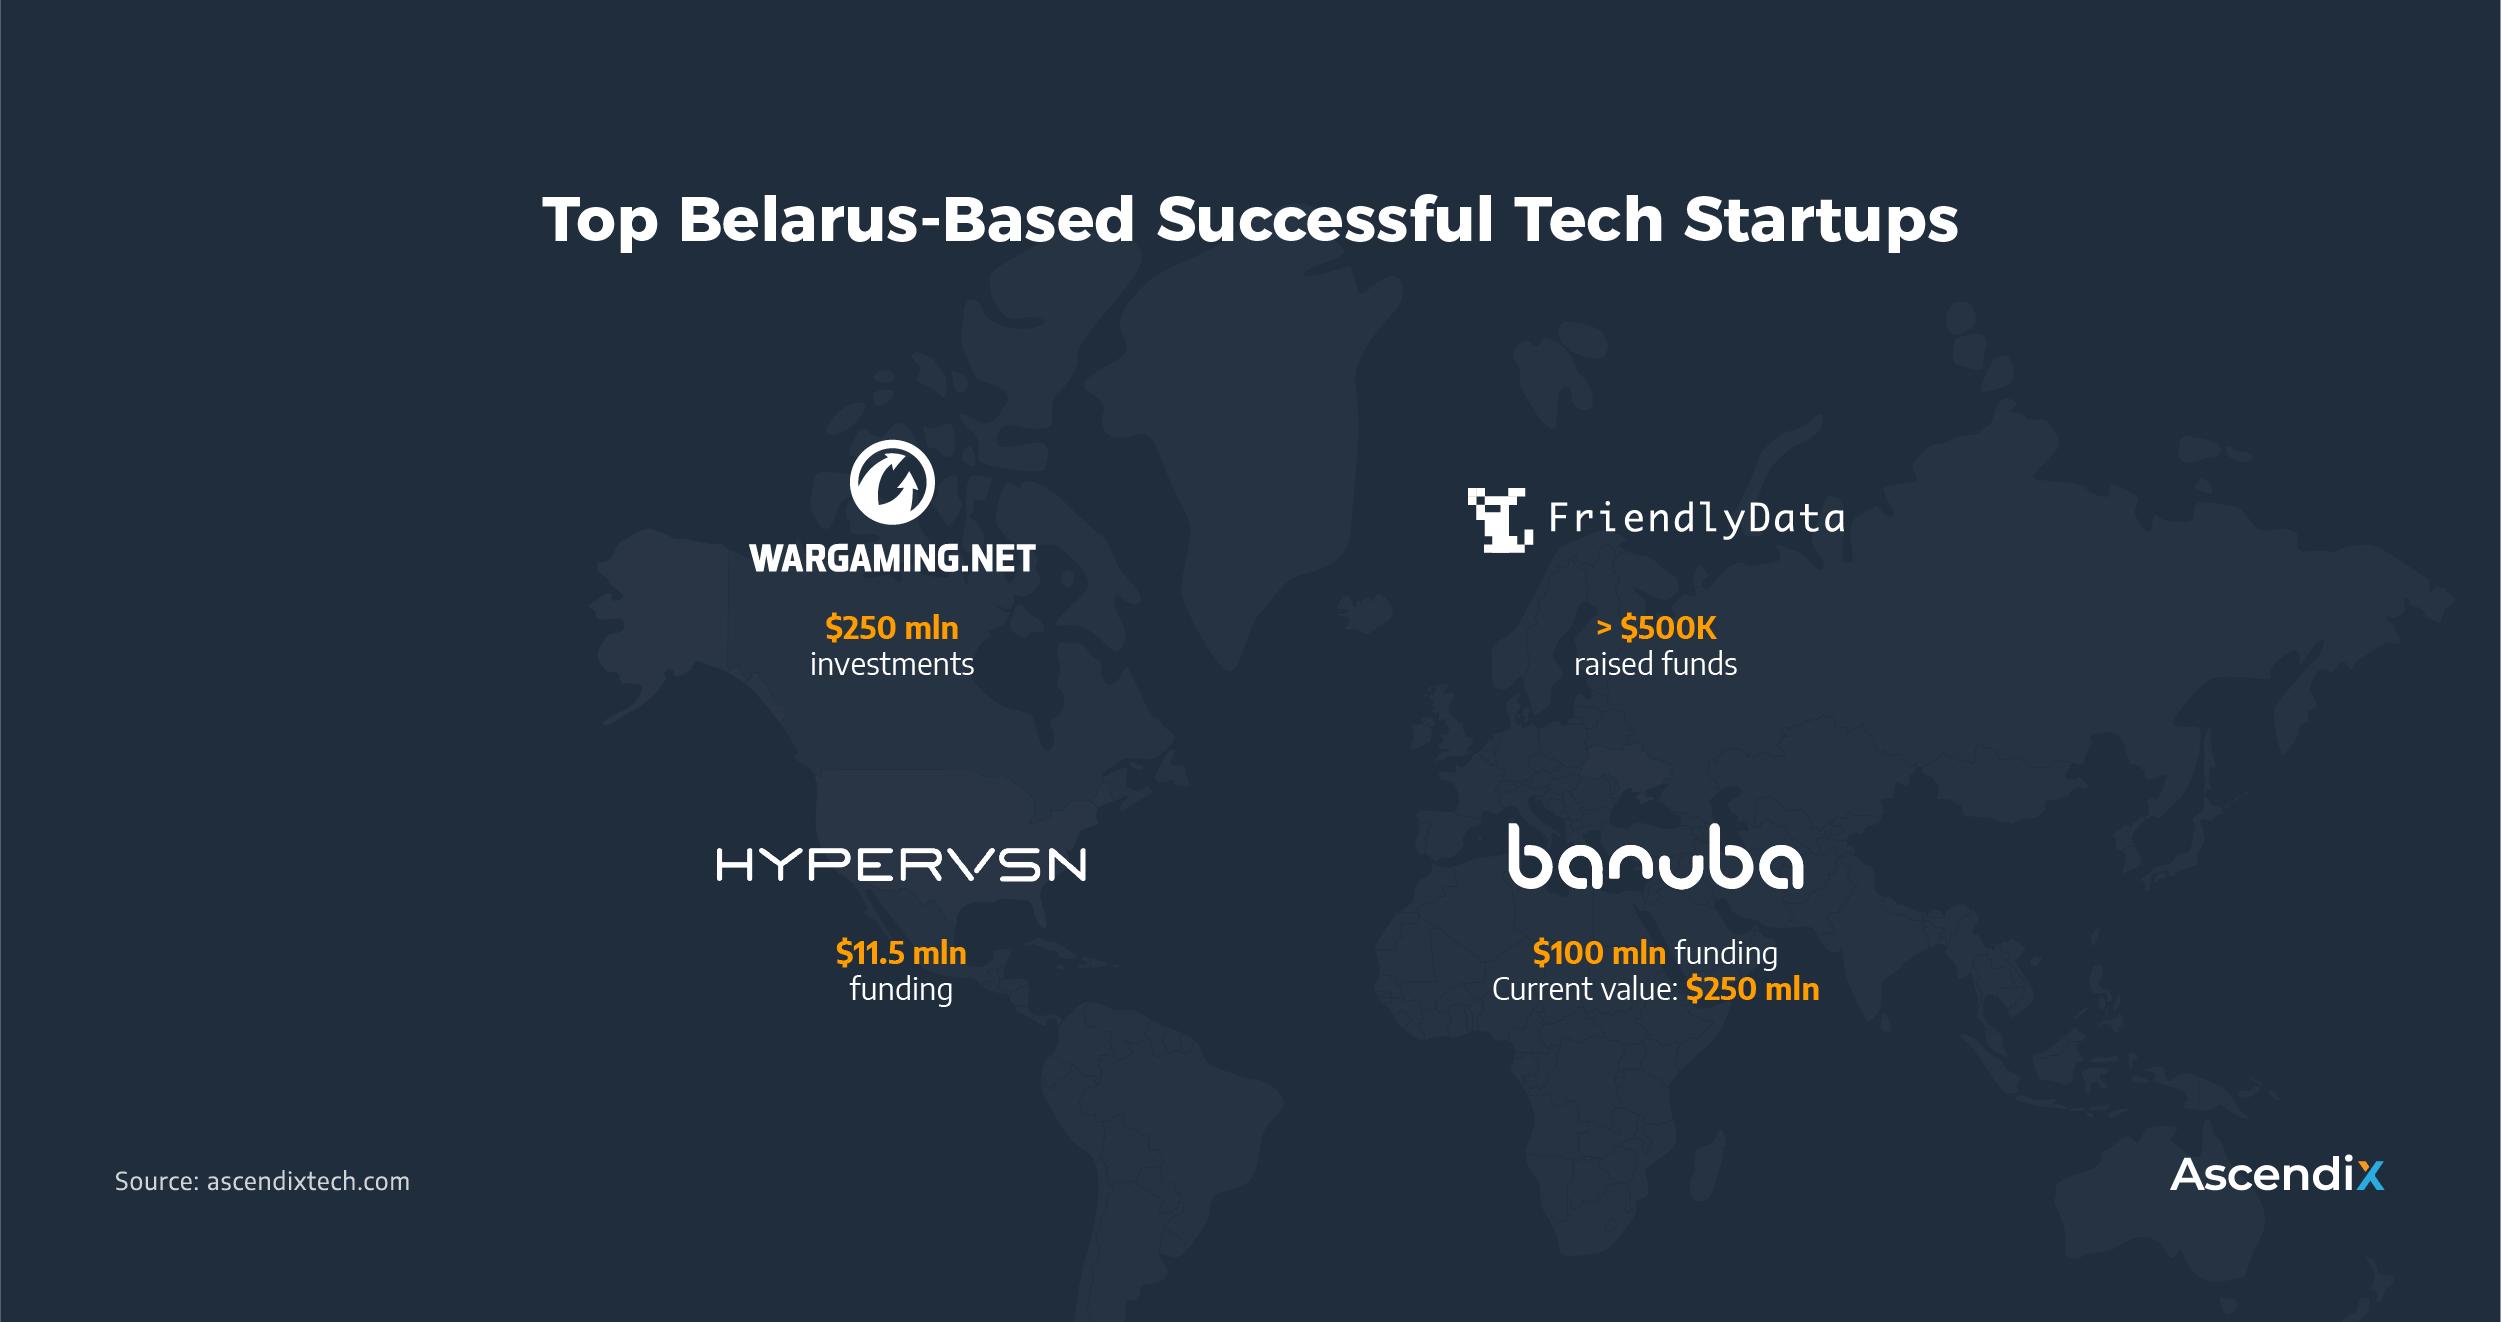 Top Belarus-Based Successful Tech Startups | Ascendix Tech